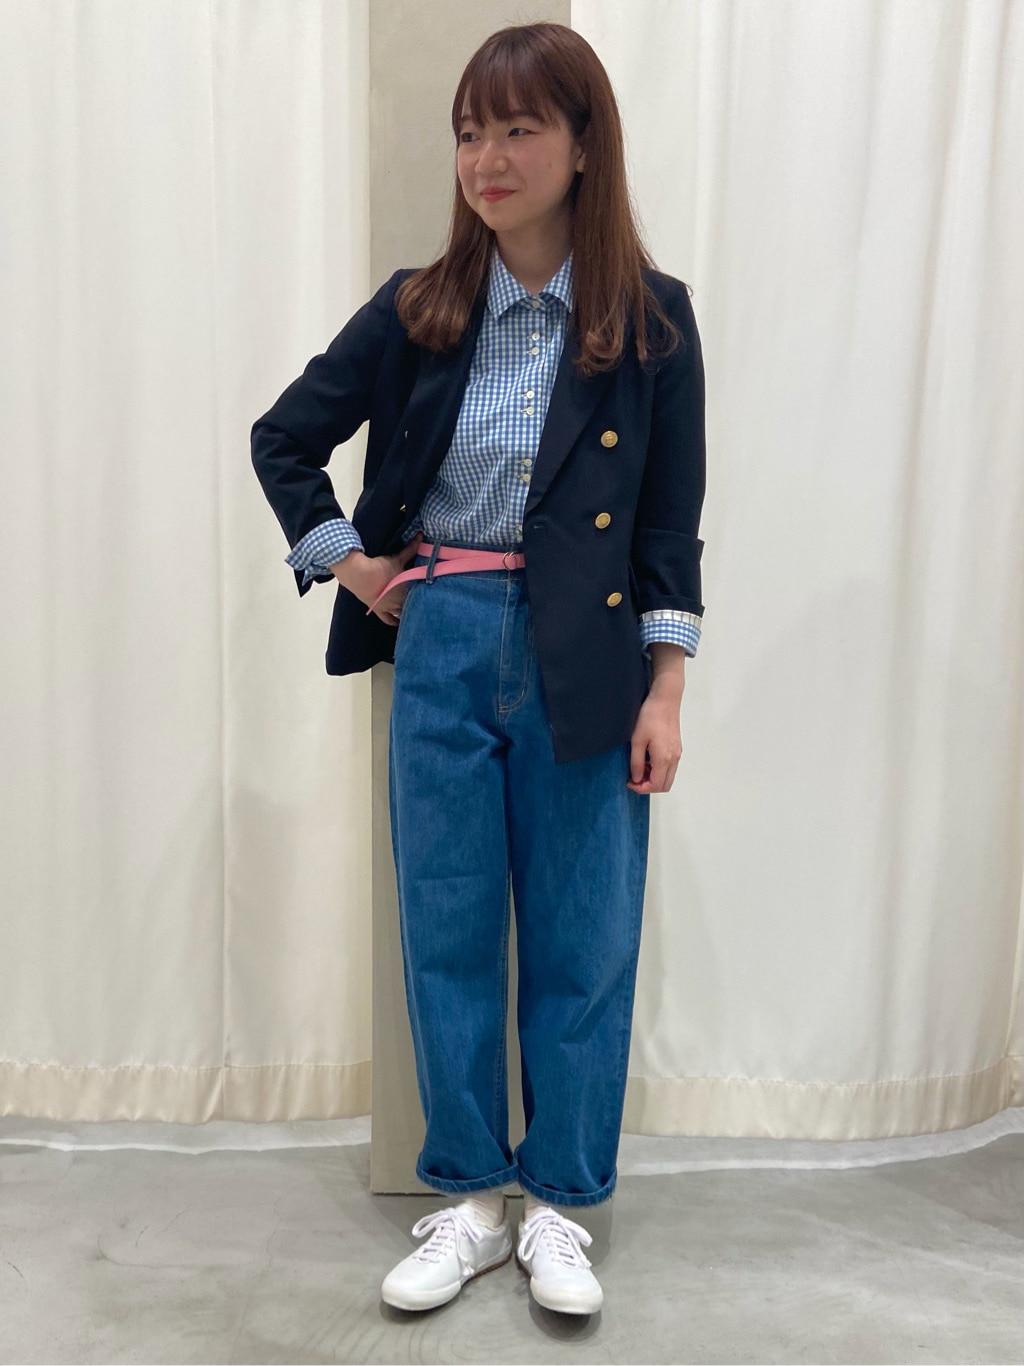 - CHILD WOMAN CHILD WOMAN , PAR ICI 東京スカイツリータウン・ソラマチ 身長:165cm 2021.02.05